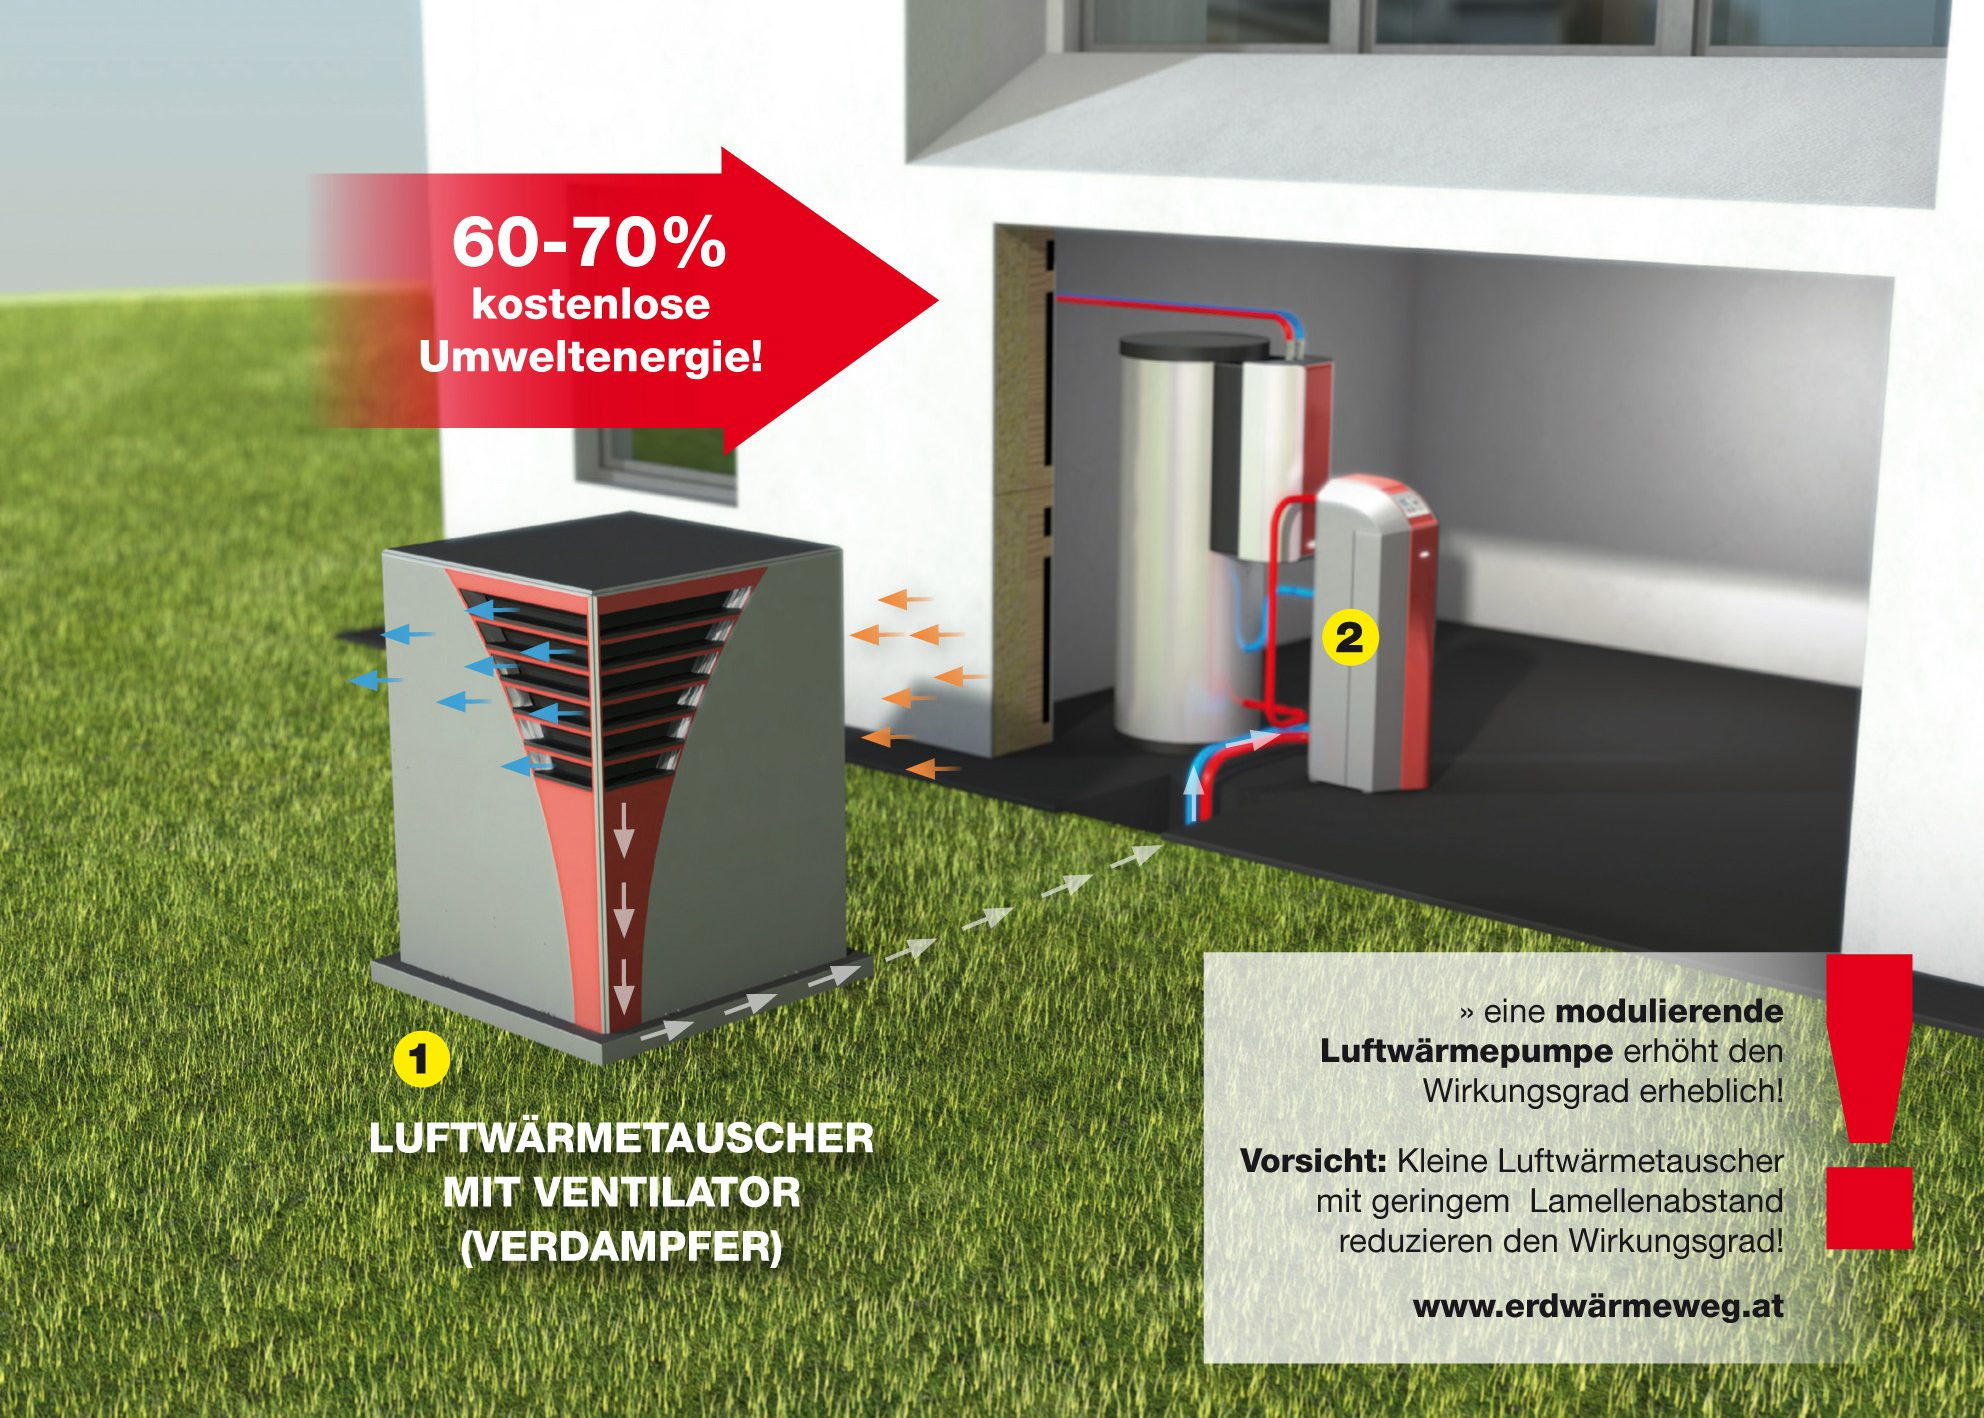 Wärmepumpe,Luftwärmenutzung,Luft-Split-Wärmepumpe